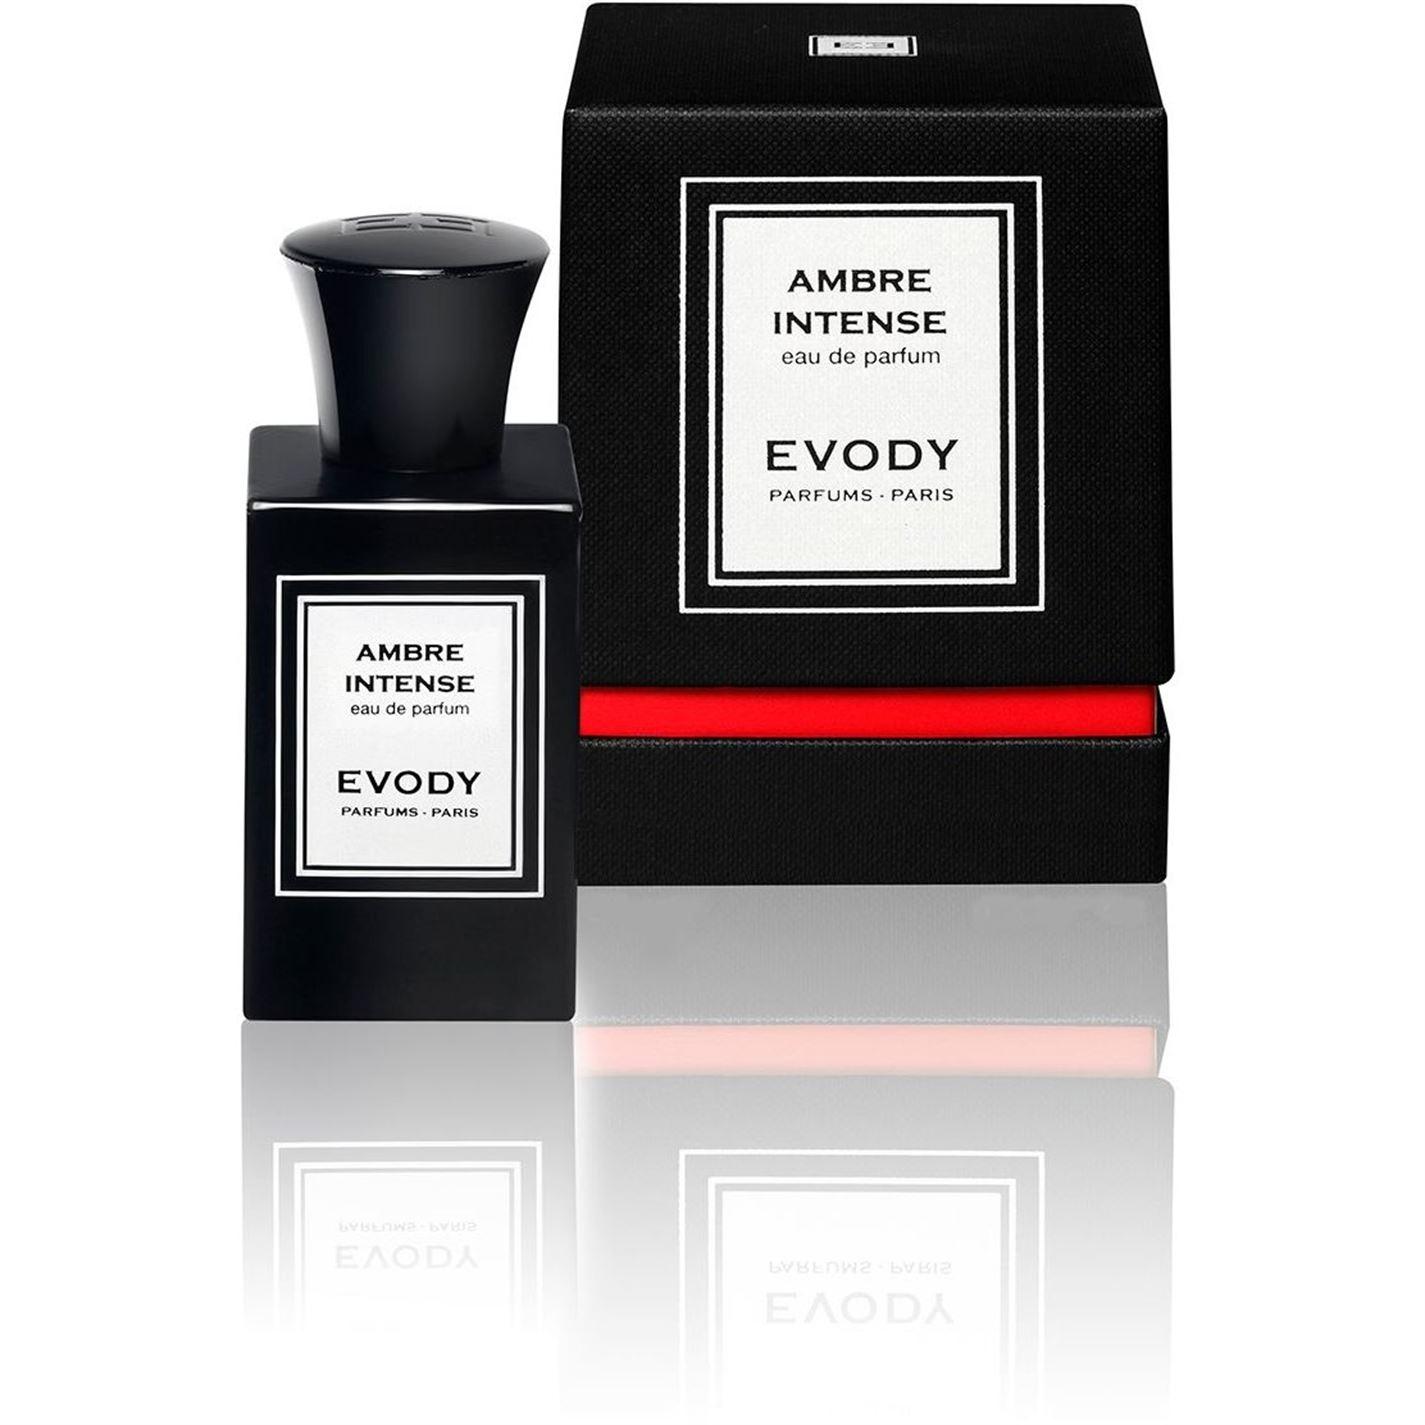 Evody Ambre Intense Eau de Parfum 100ml